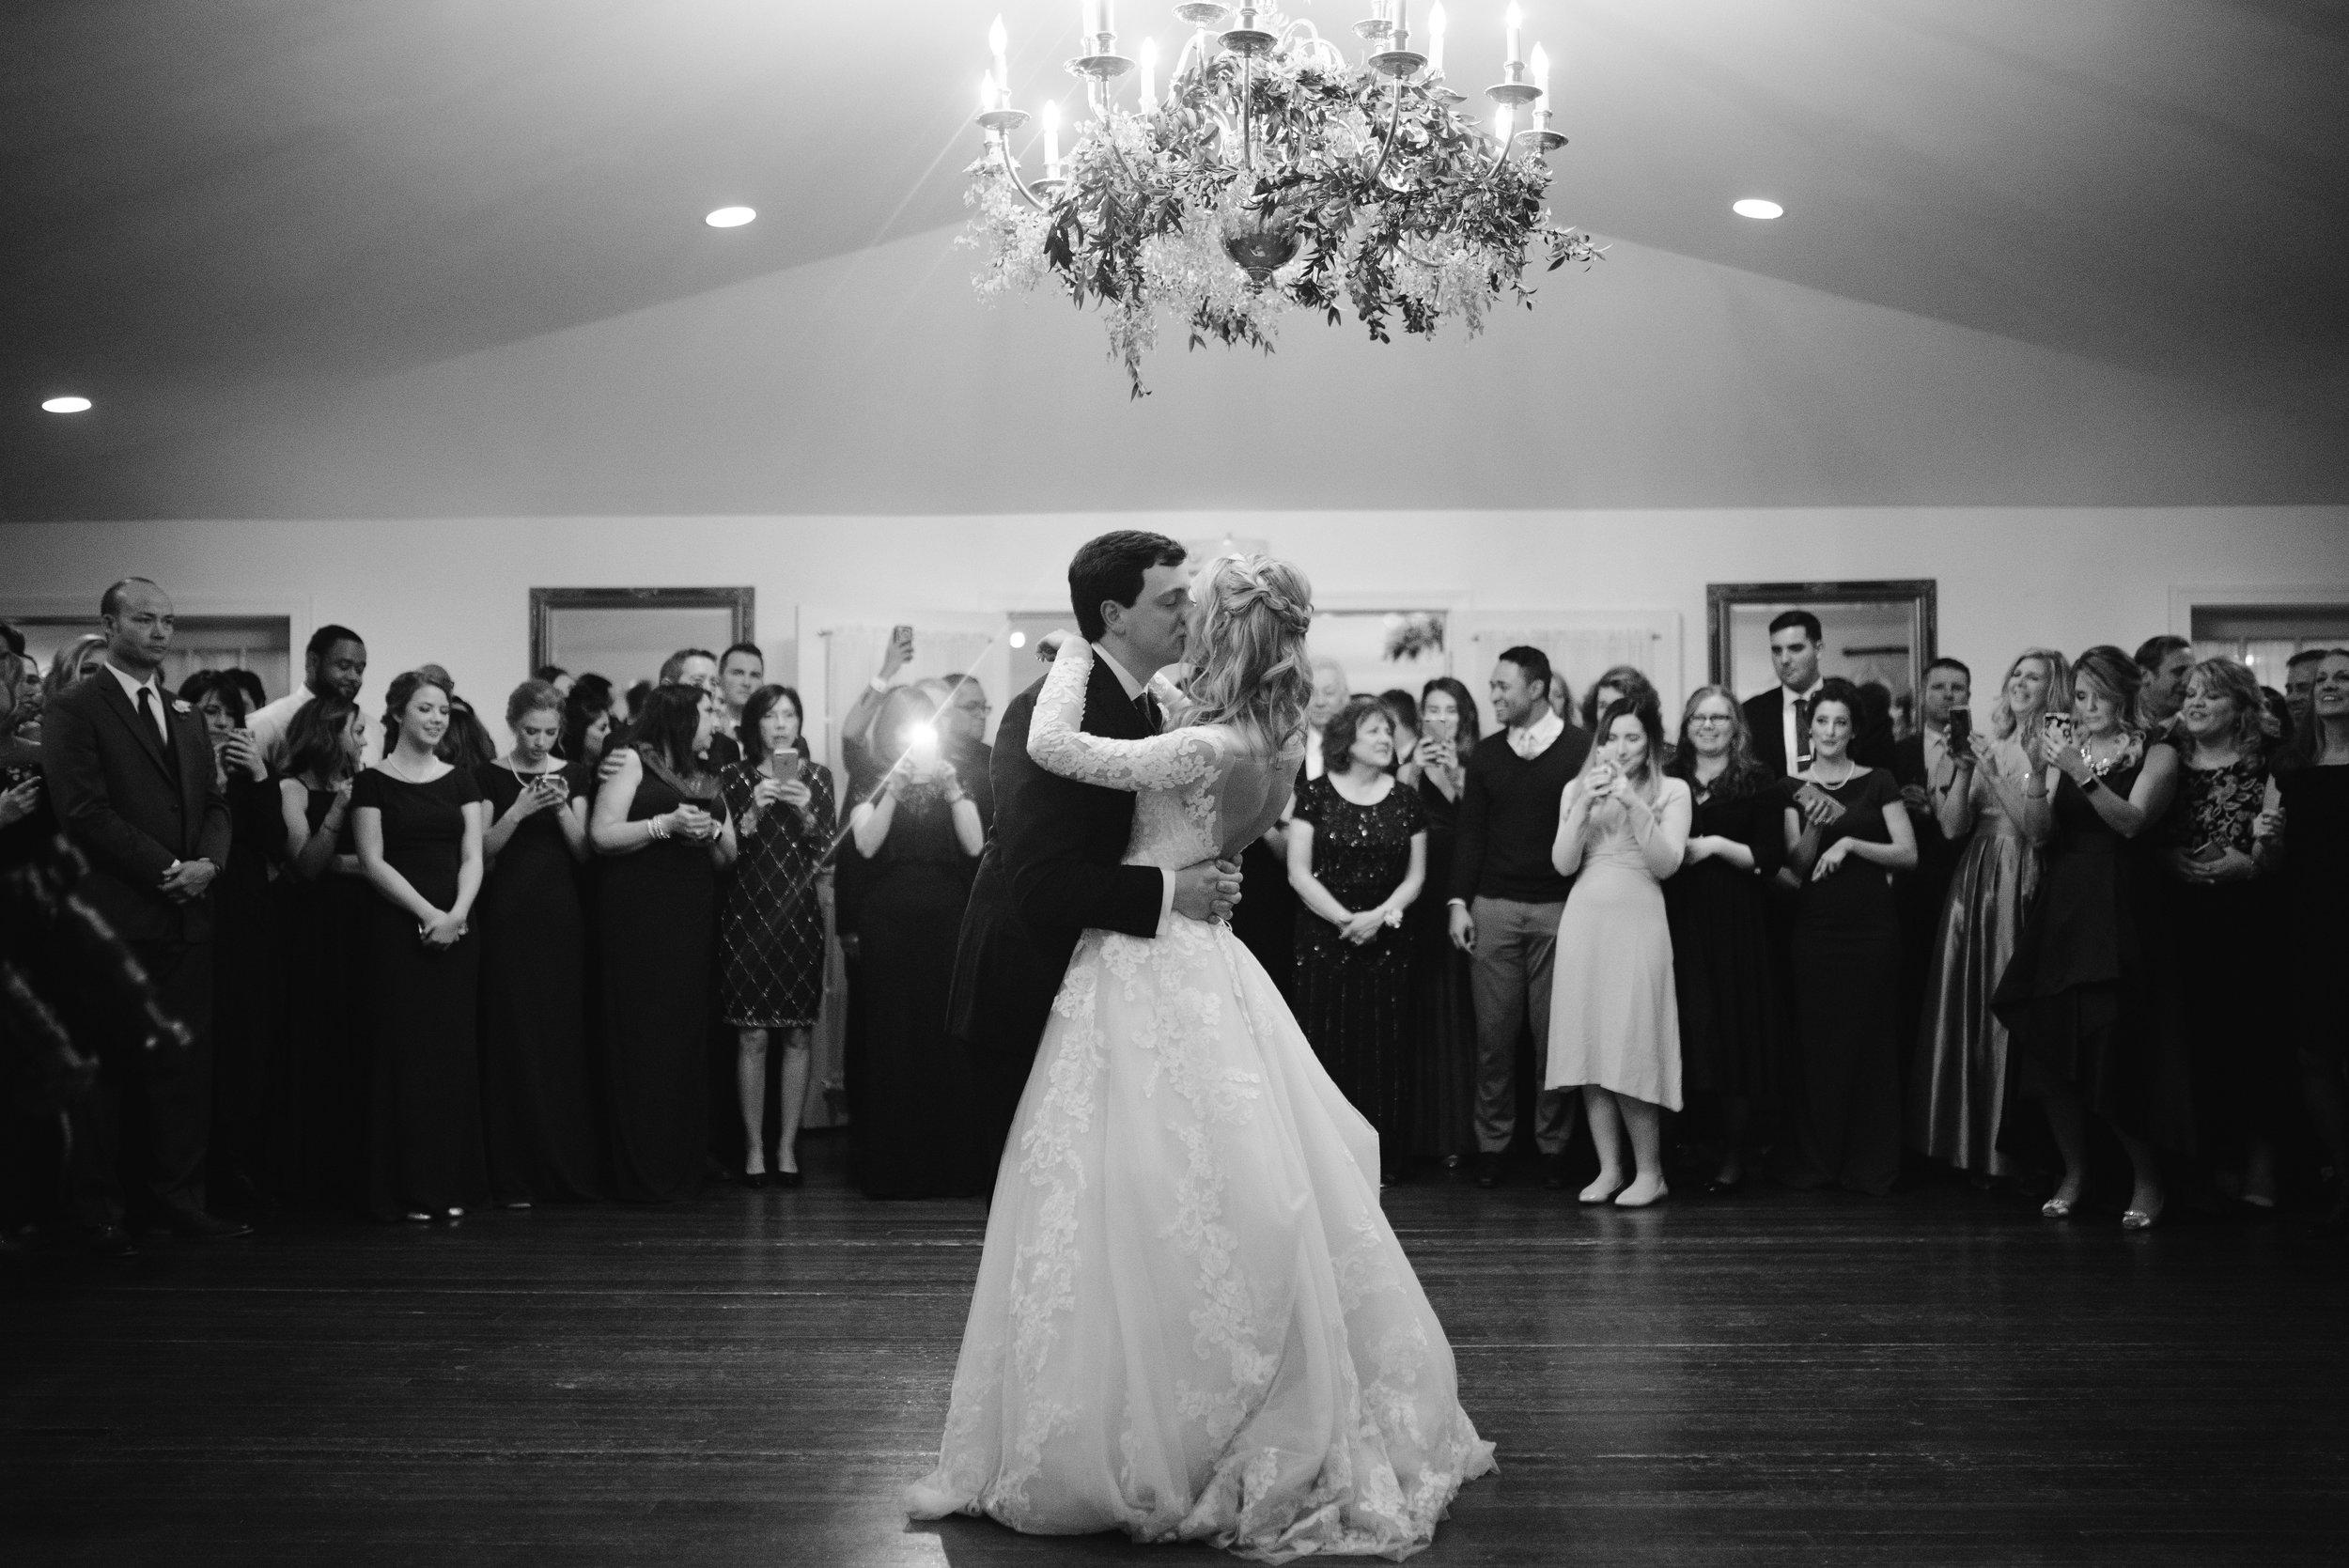 antrim-18444-spencer-wedding-1611.jpg